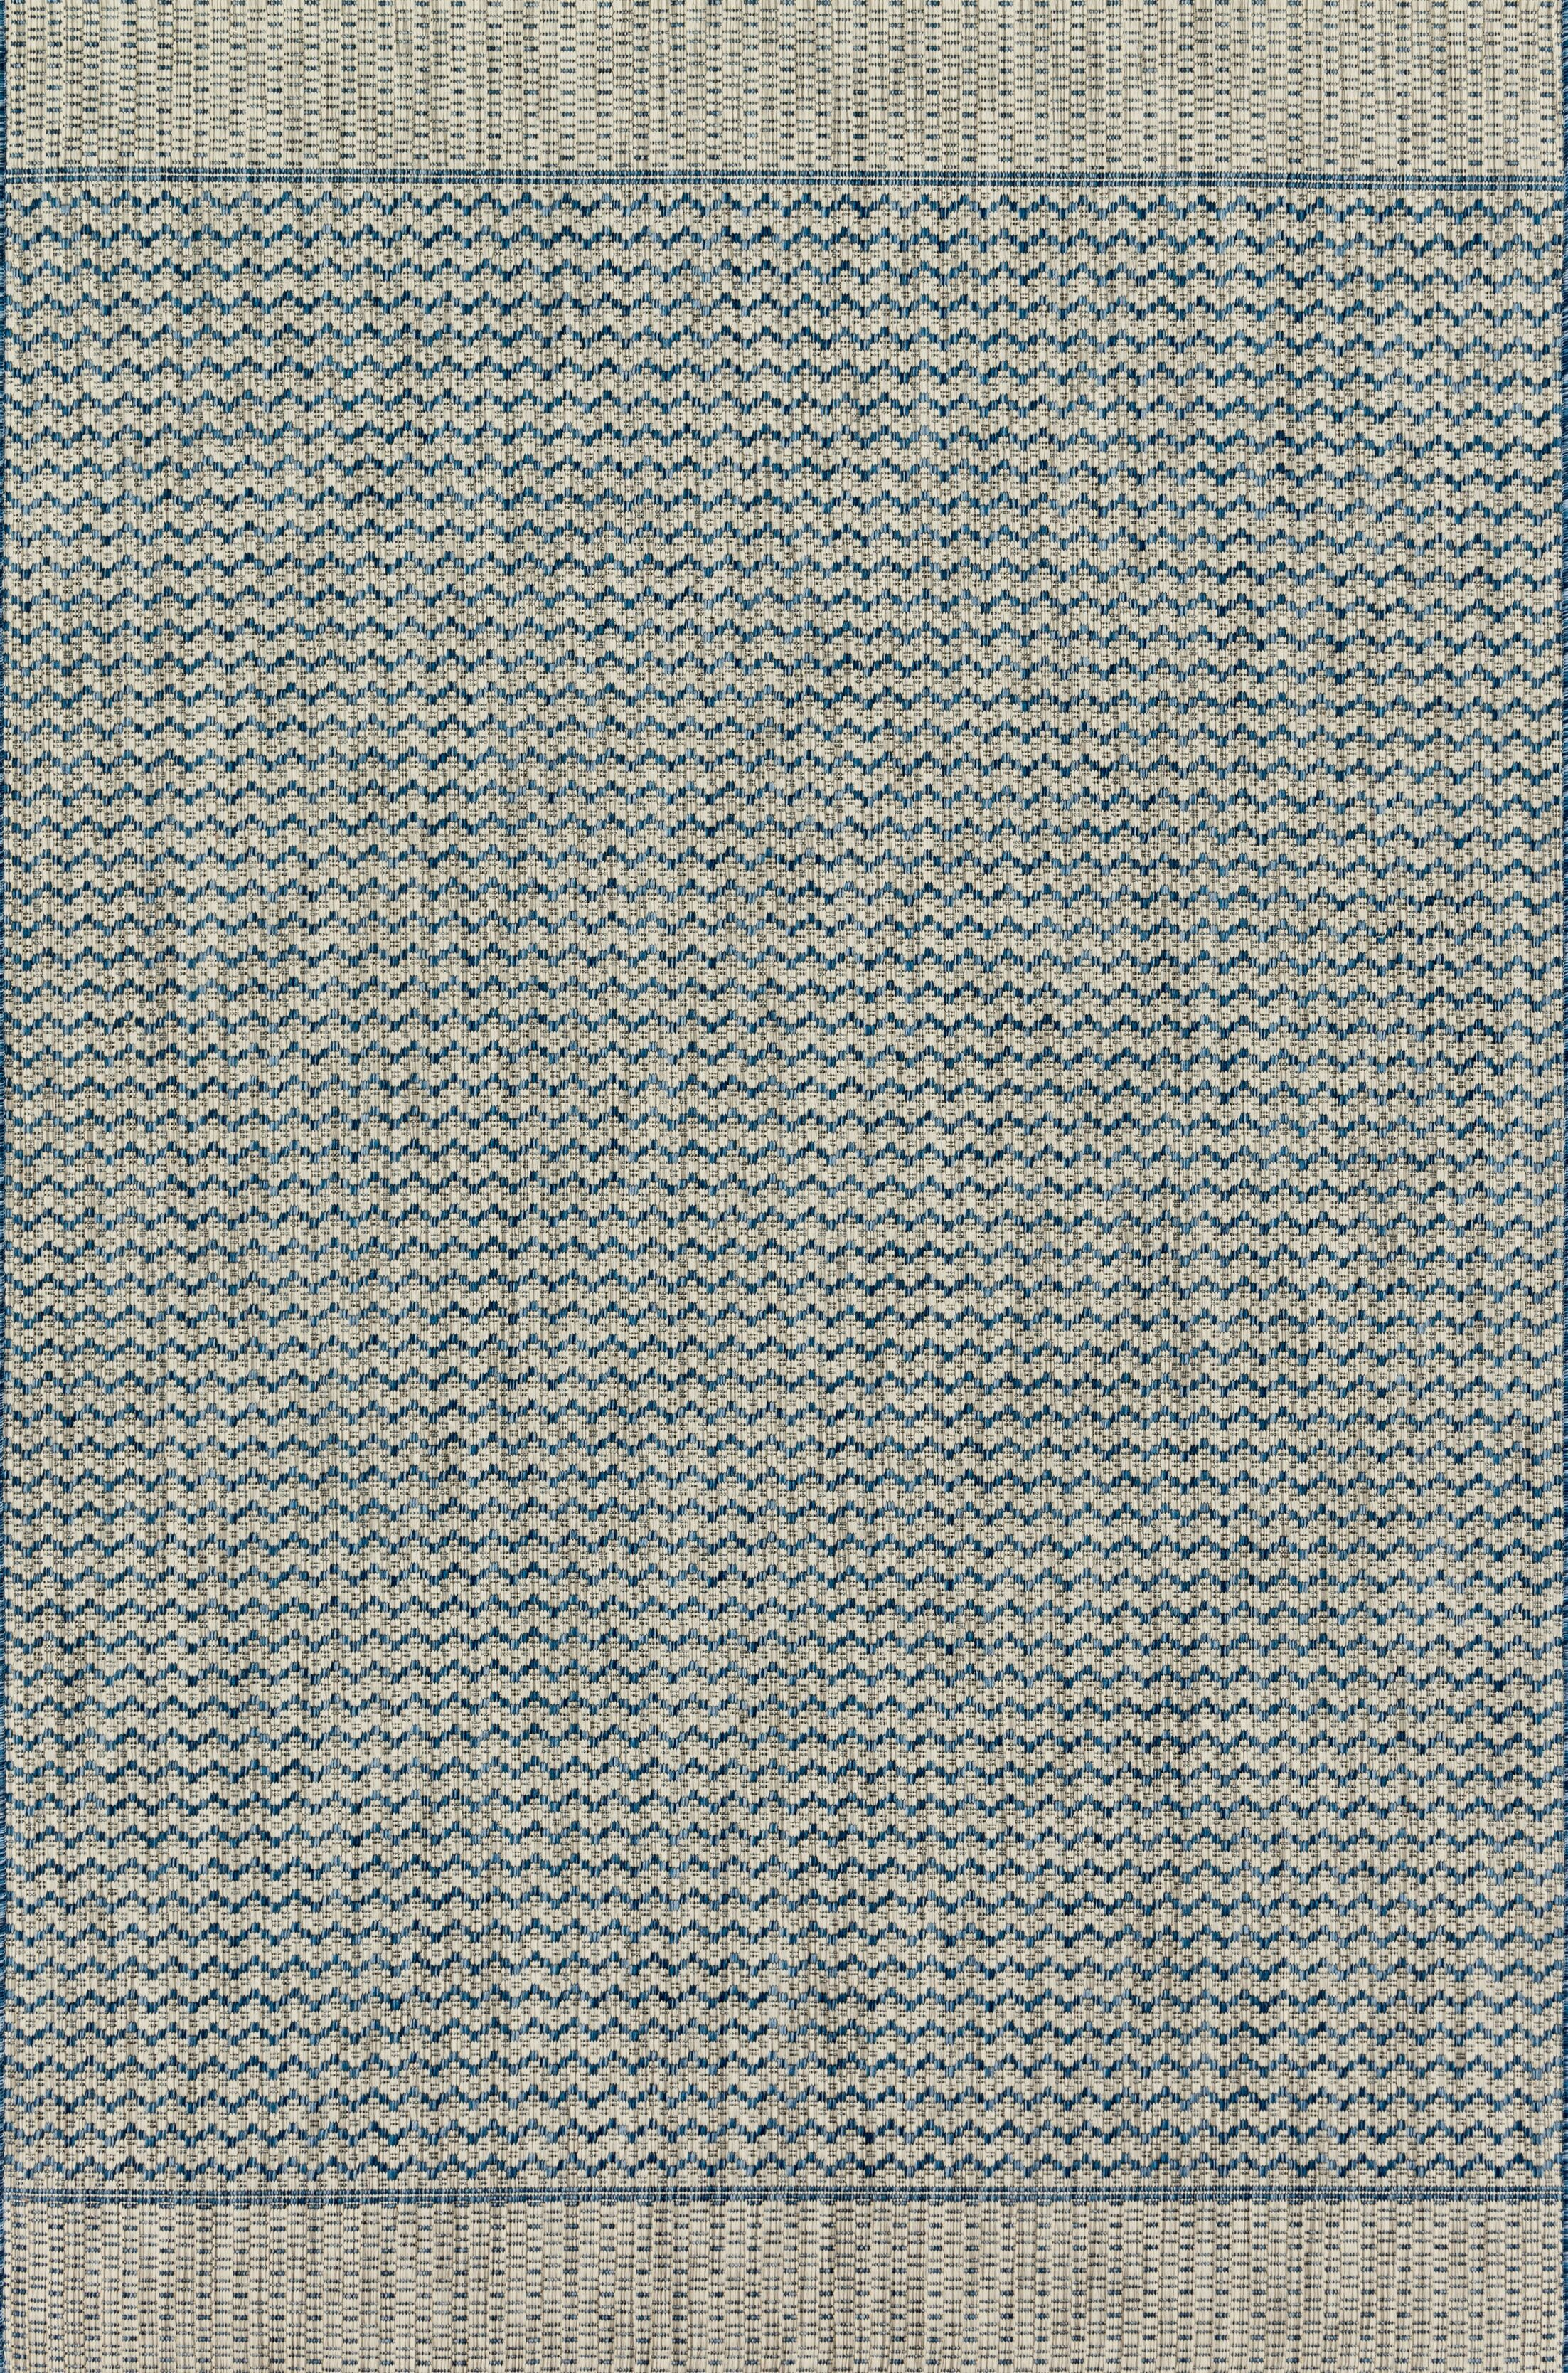 Bundy Gray/Blue Indoor/Outdoor Area Rug Rug Size: Rectangle 7'10